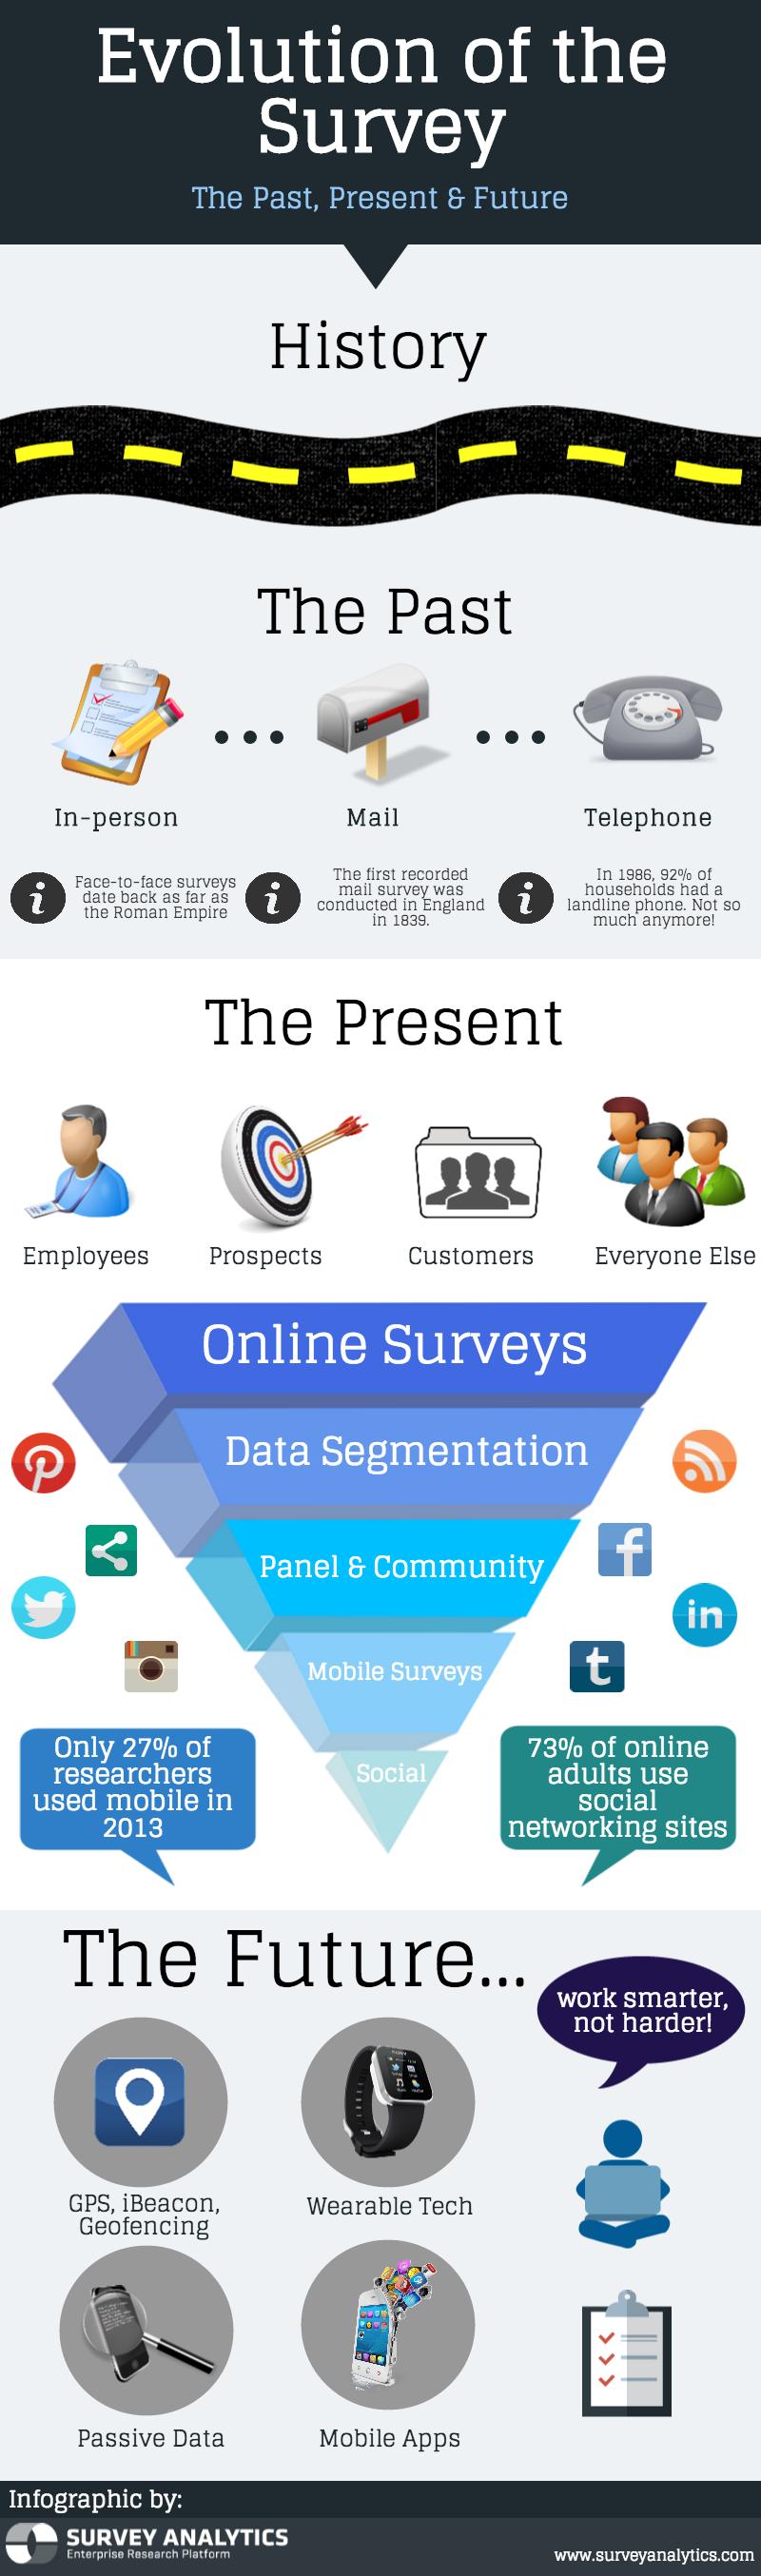 Evolution of the Survey